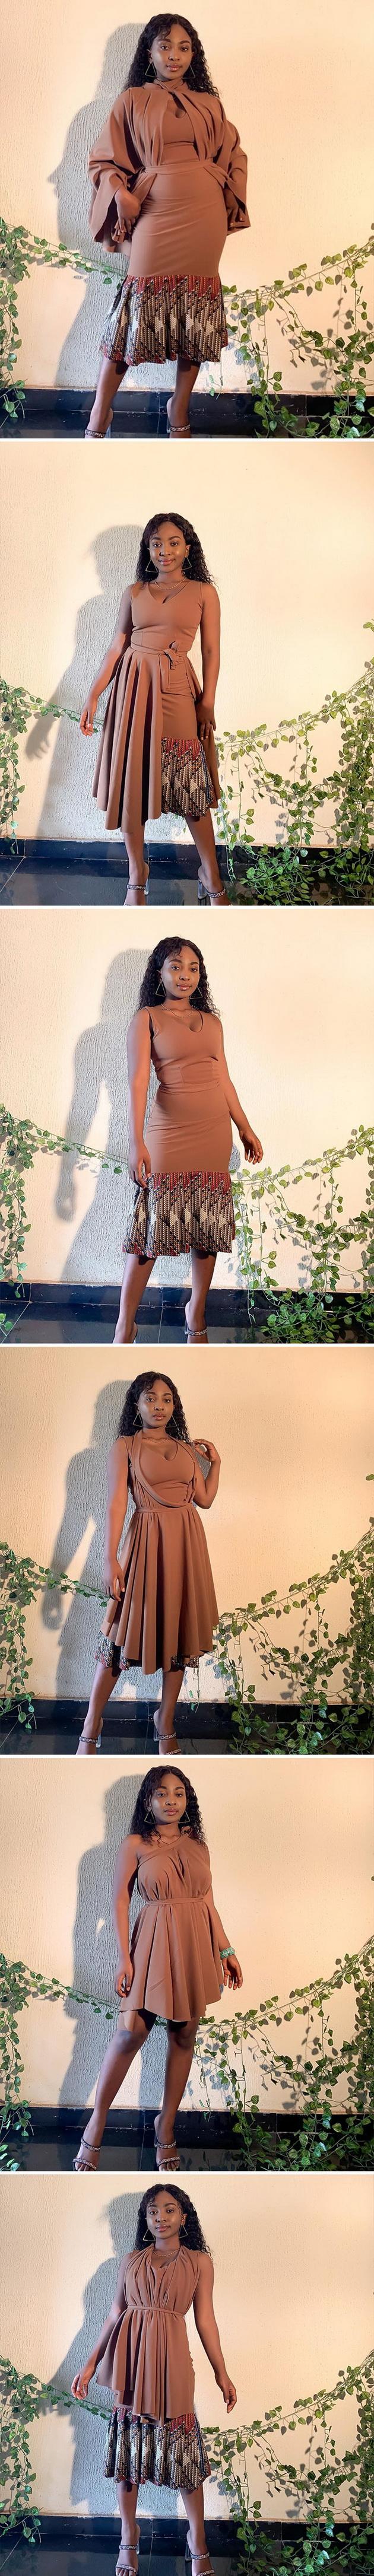 koga-vo-1-fustan-imate-11-razlichni-fustani-nigeriska-dizajnerka-go-voodushevi-svetot-10.jpg